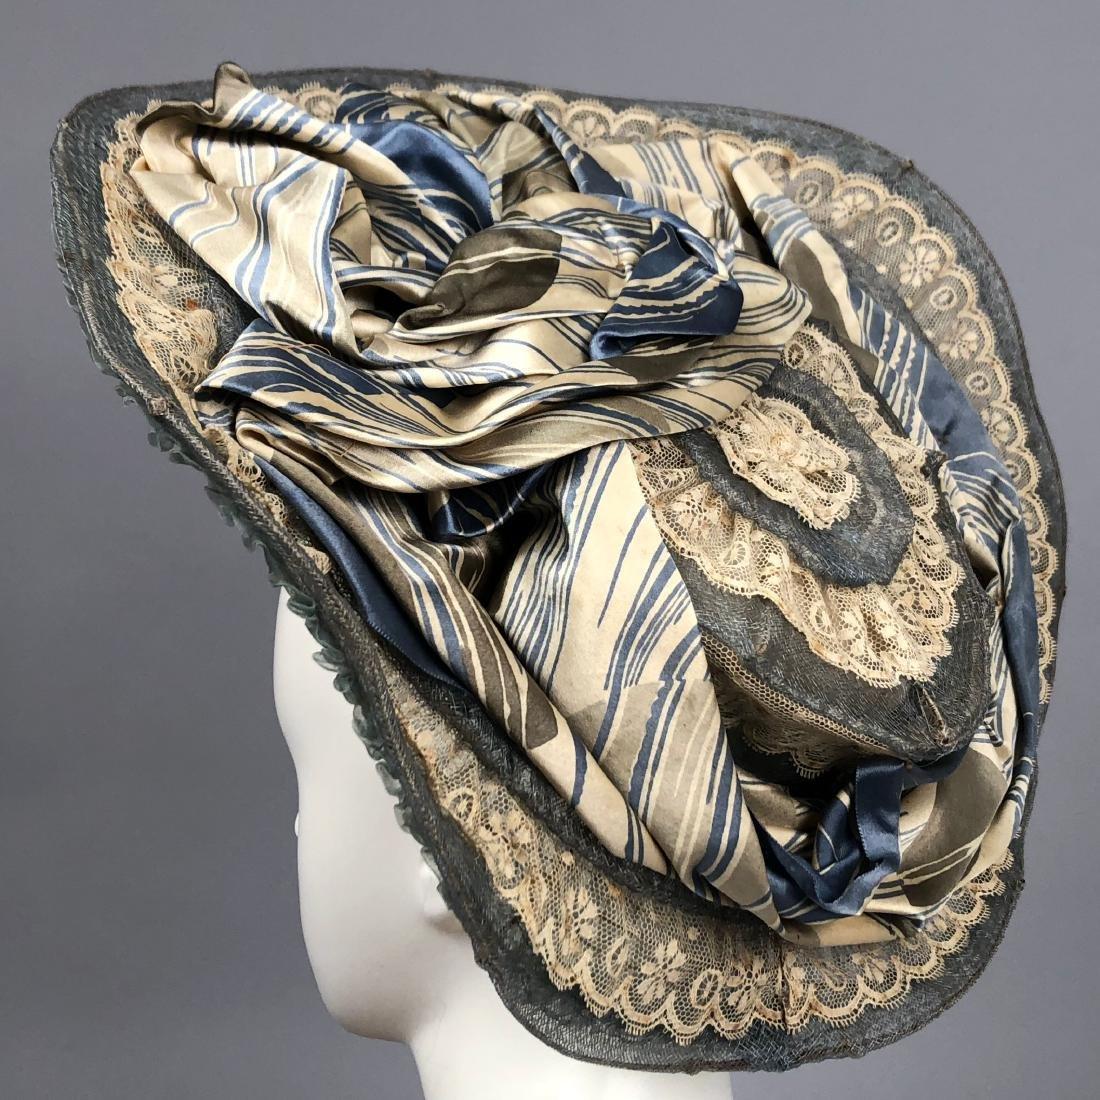 THREE WIDE-BRIM HATS, 1902 - 1910 - 5